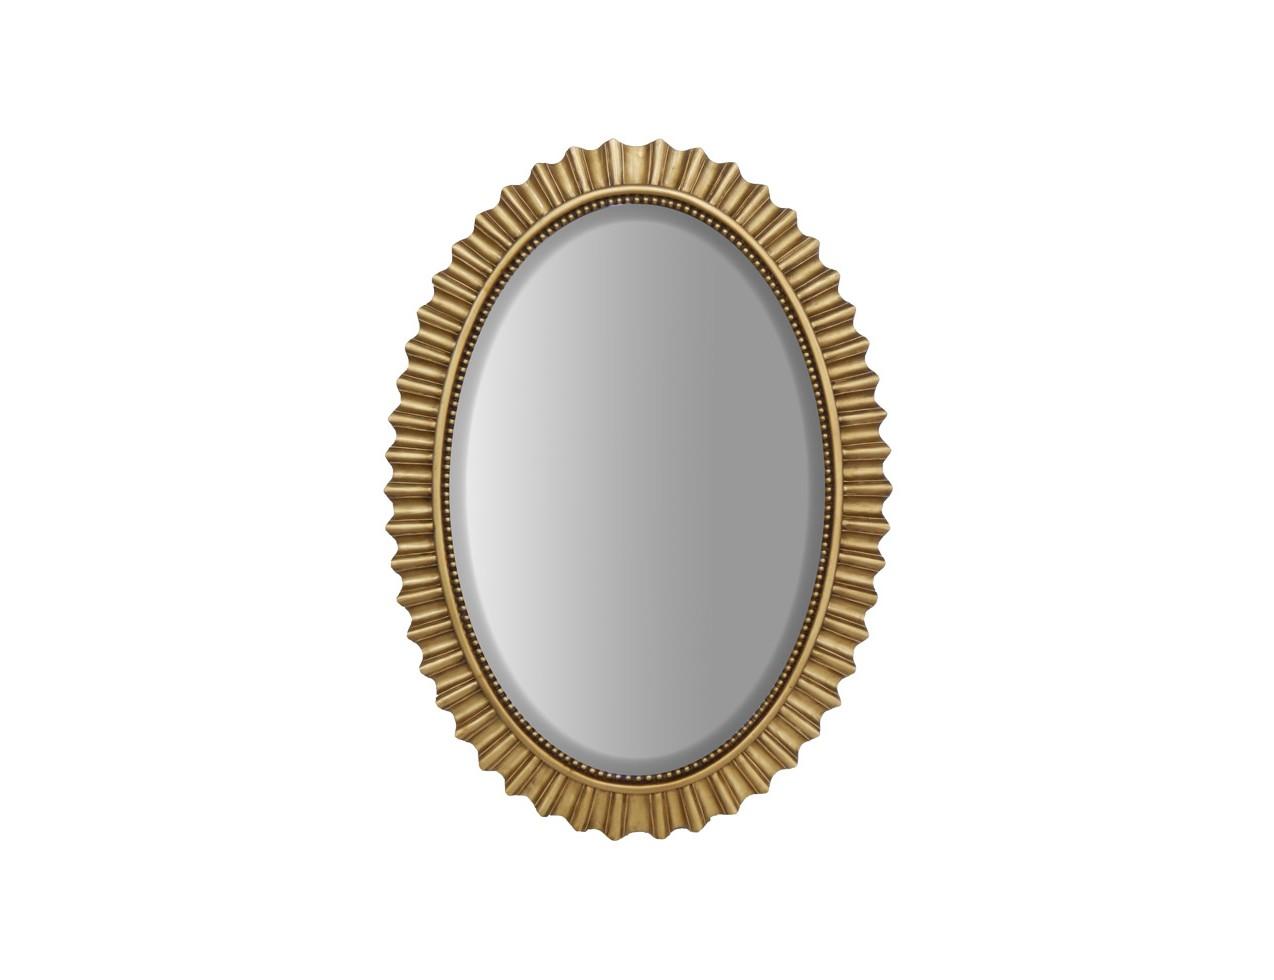 Зеркало OvalНастенные зеркала<br><br><br>Material: Стекло<br>Ширина см: 92<br>Высота см: 125<br>Глубина см: 14